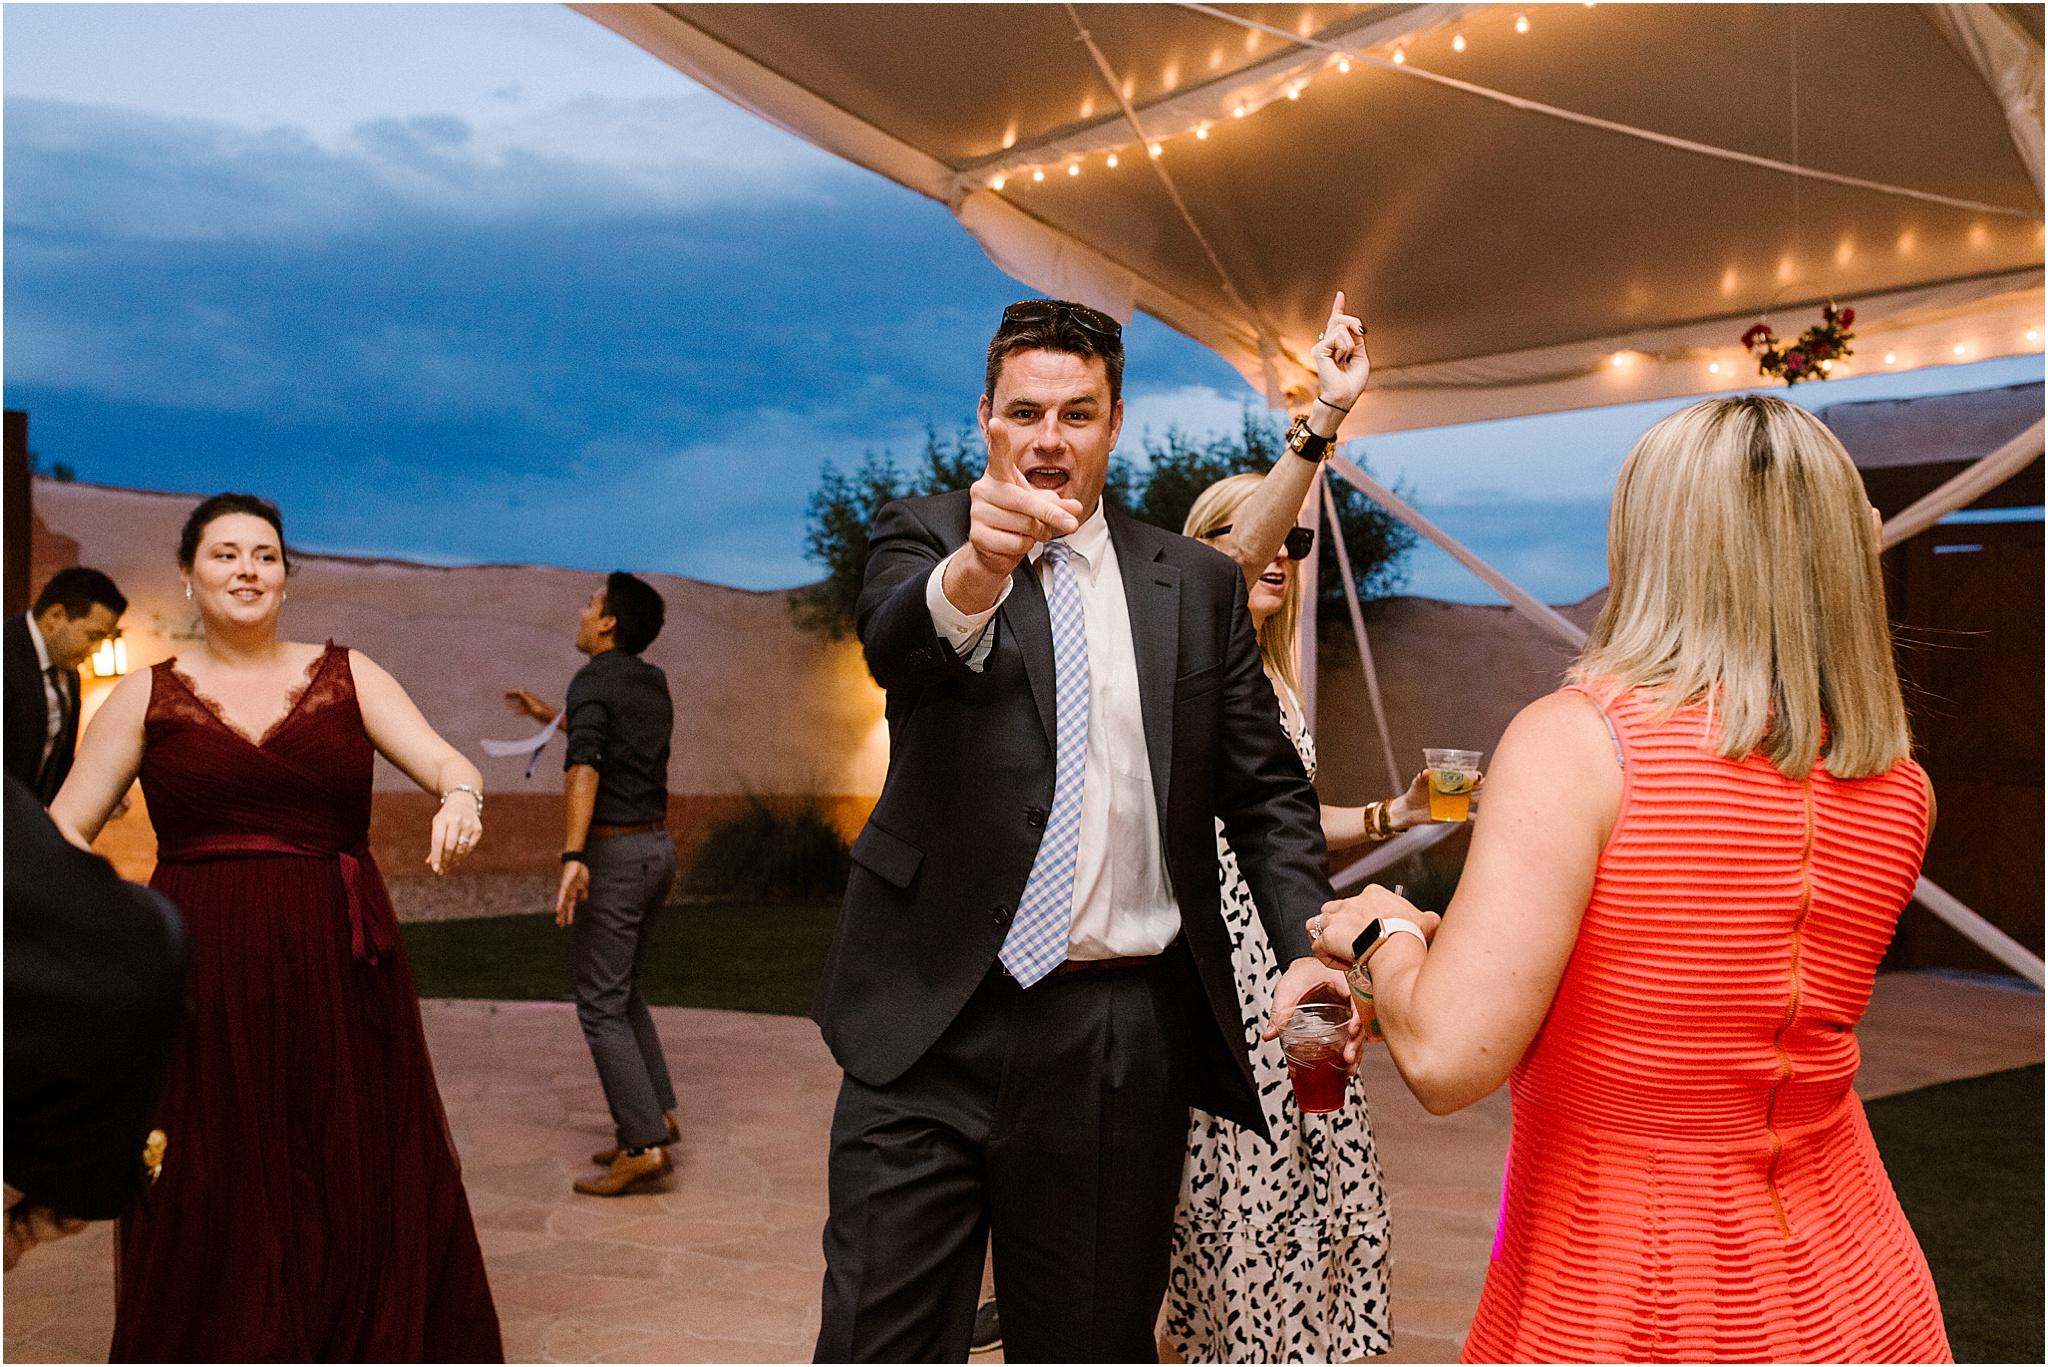 JENNA_JEROME_BLUE ROSE PHOTOGRAPHY_ABQ WEDDING_57